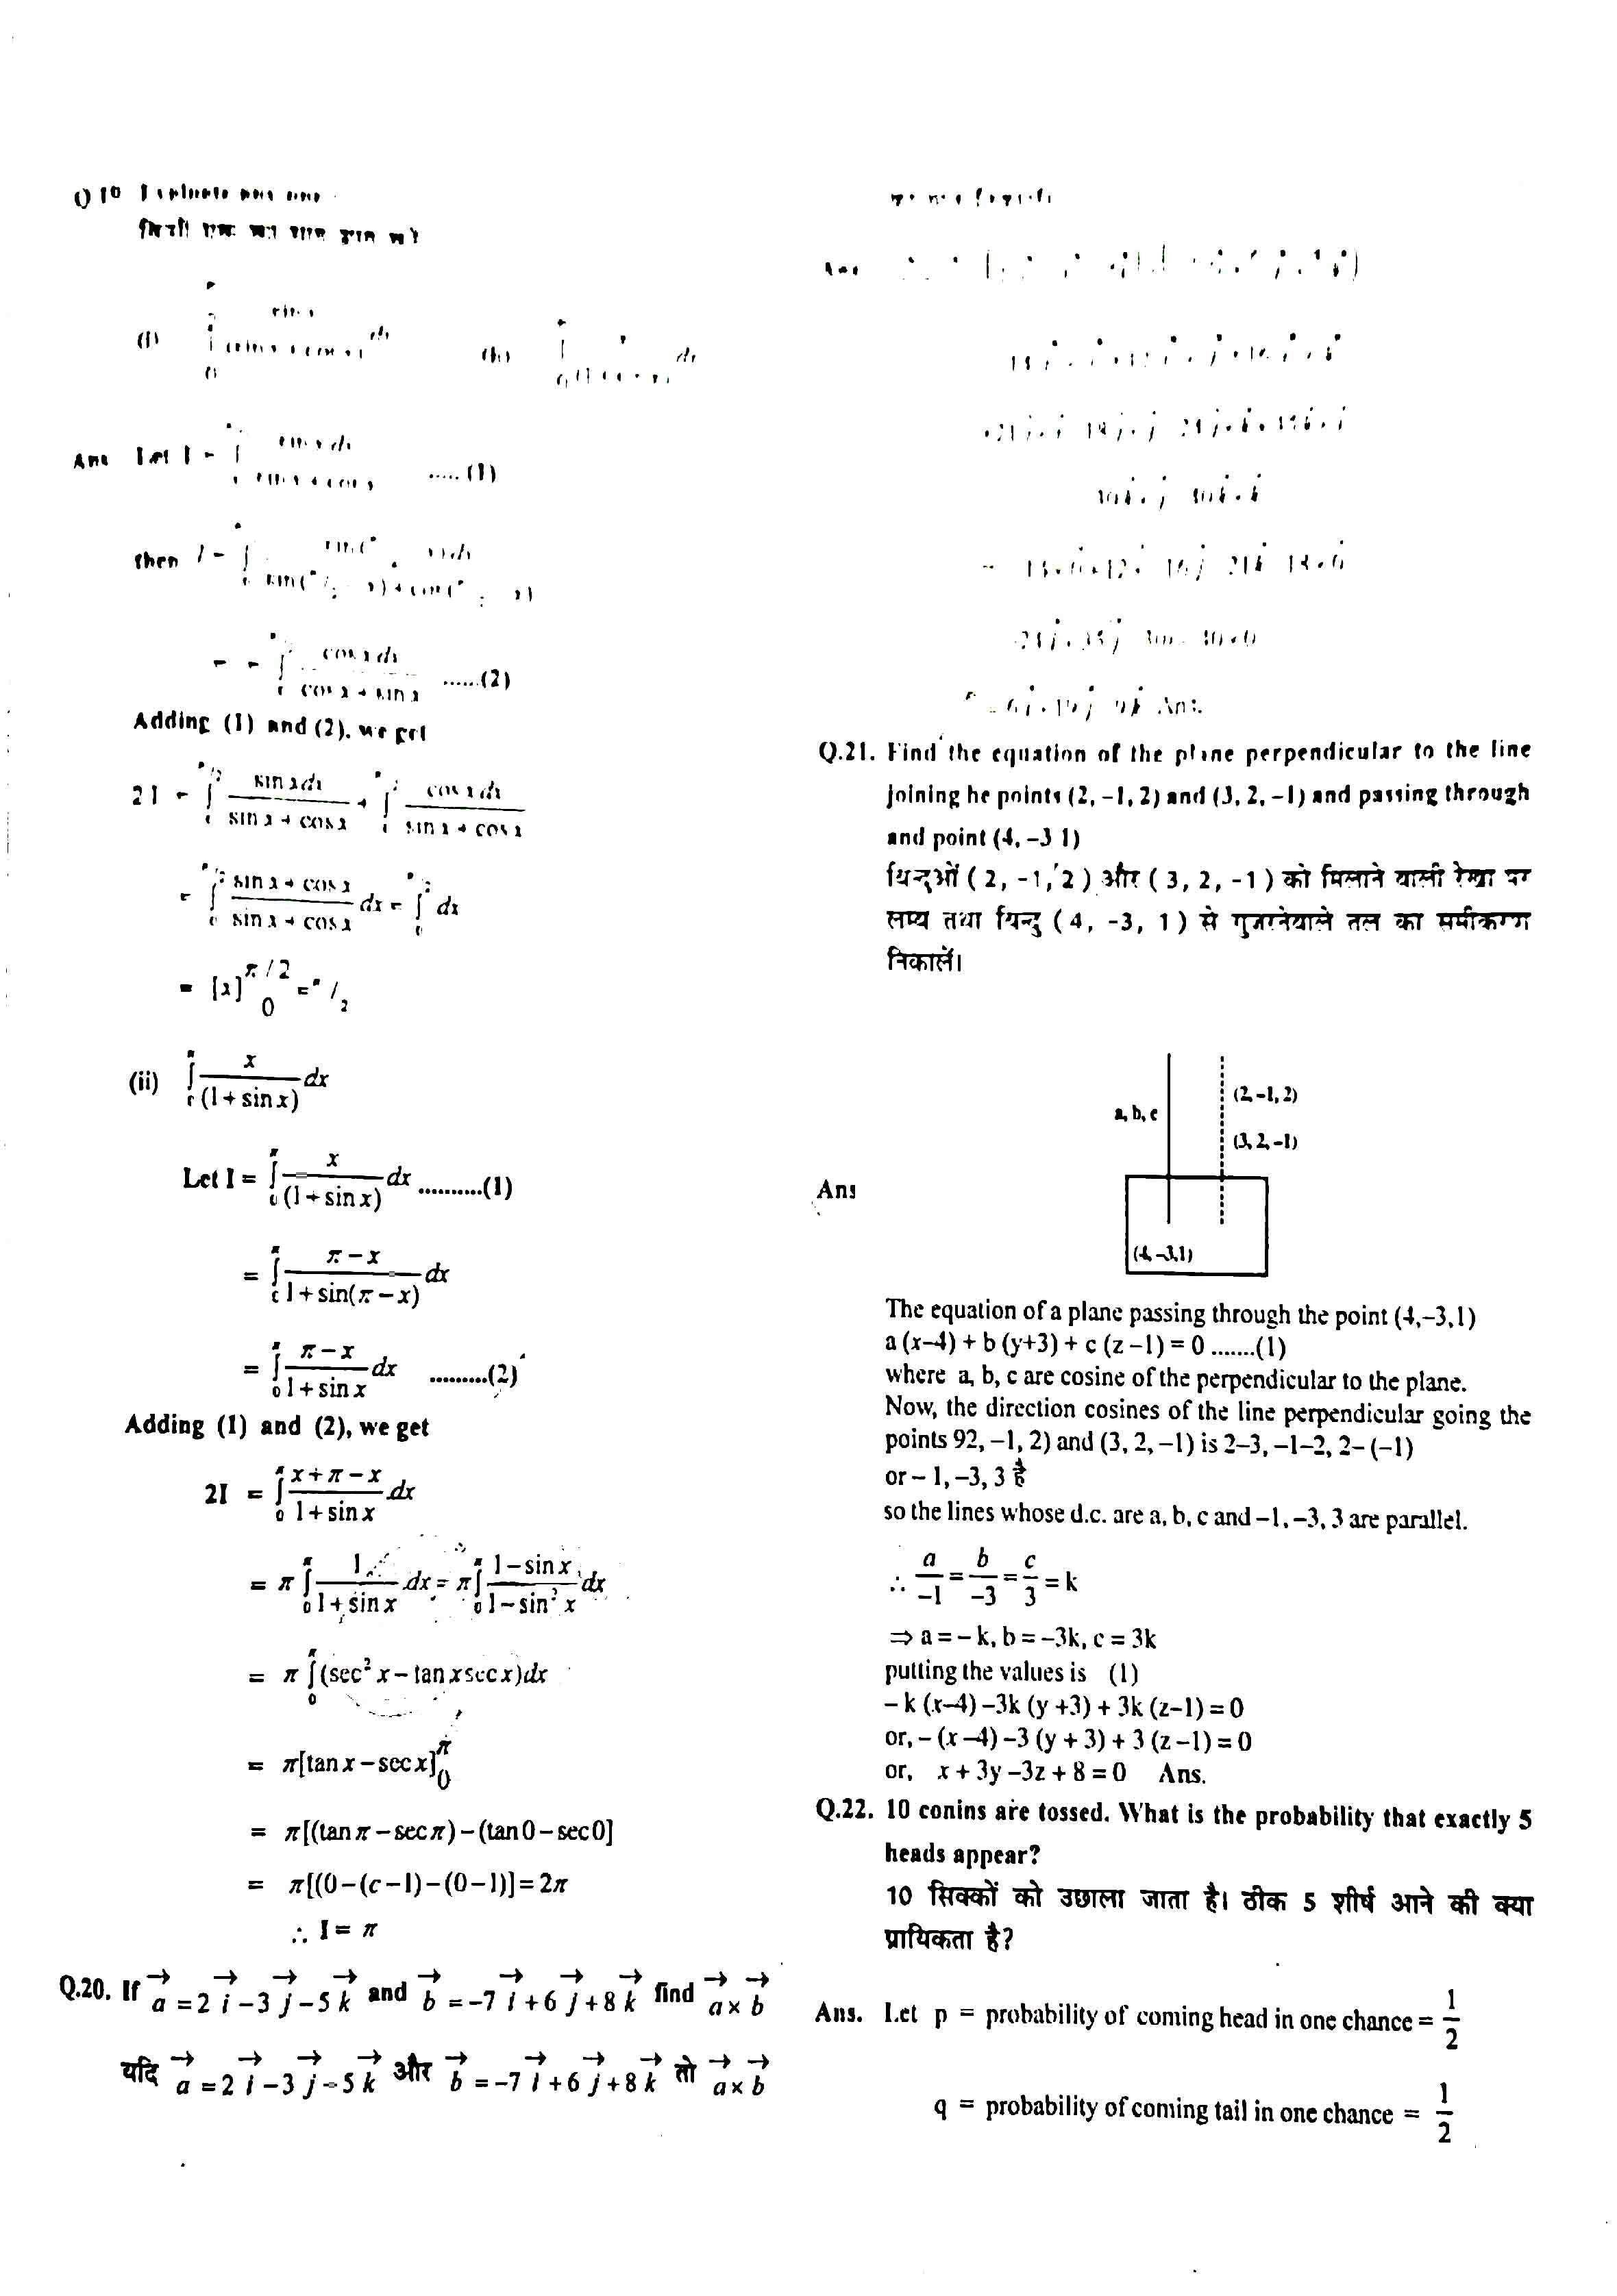 JAC Class 12 math 2013 Question Paper 05